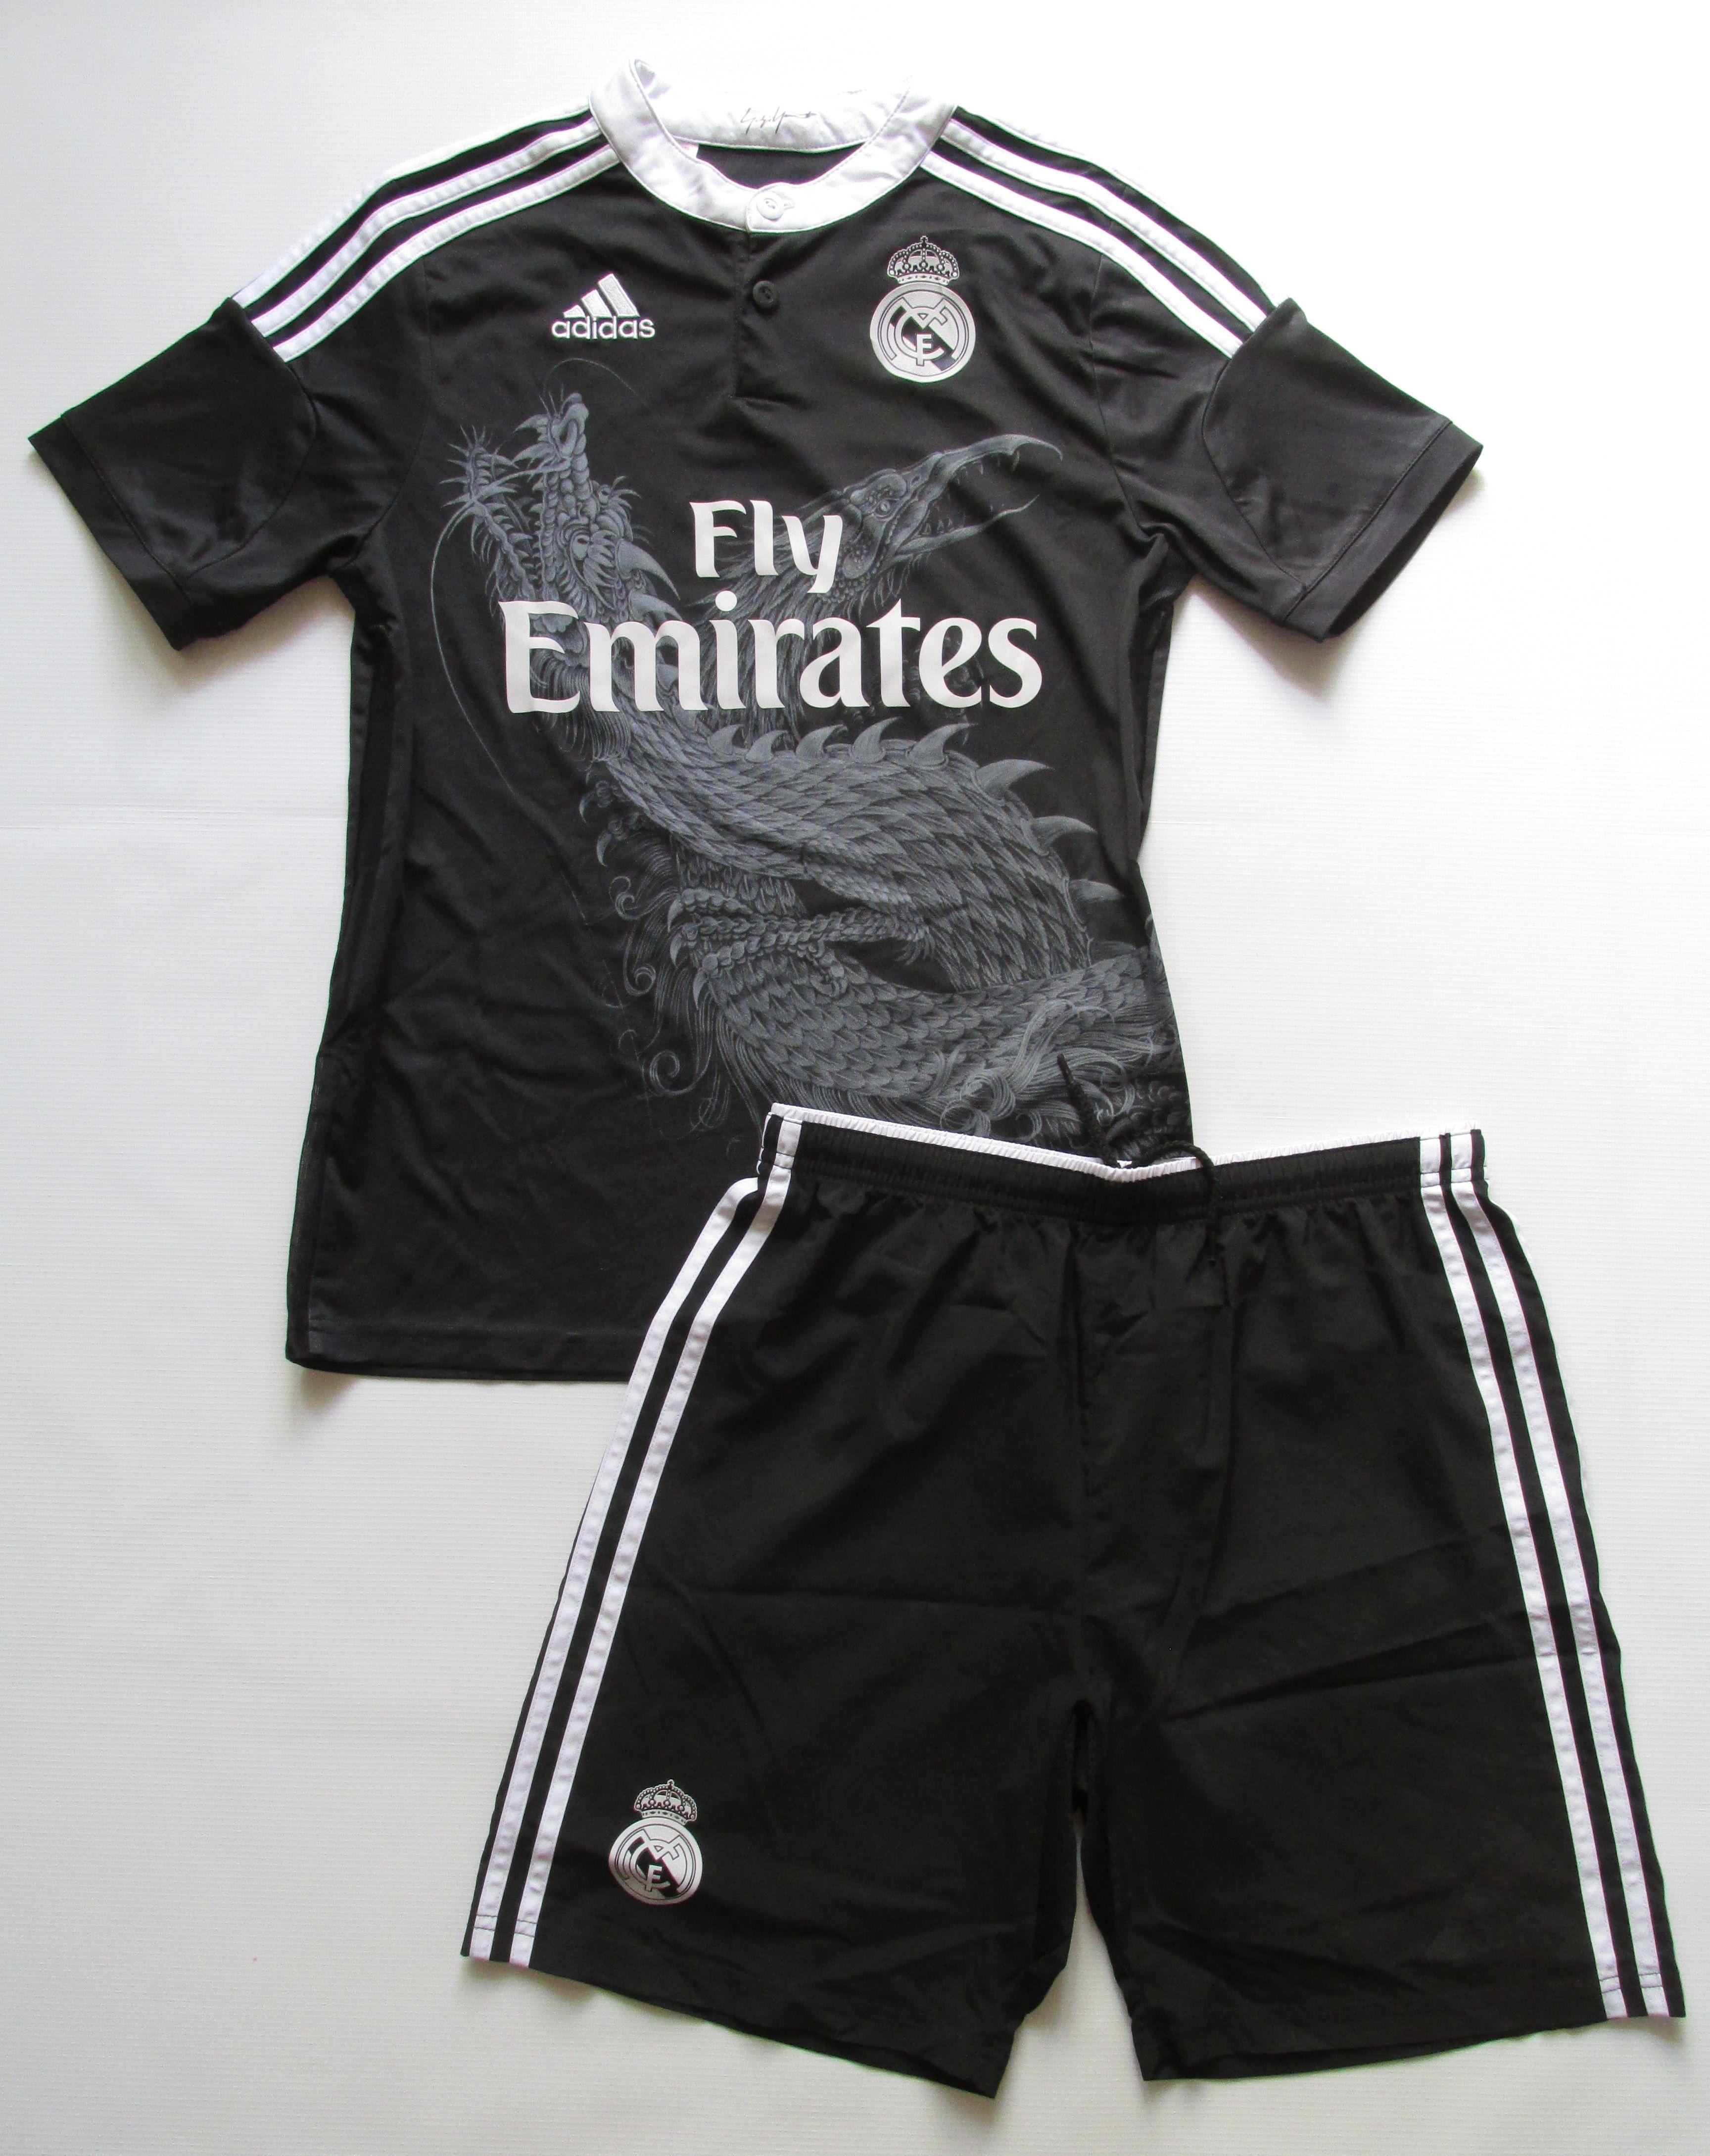 0f82c12b4 Real Madrid 2014 2015 third football kit by Adidas   Yohji Yamamoto Spain  footballshirt jersey